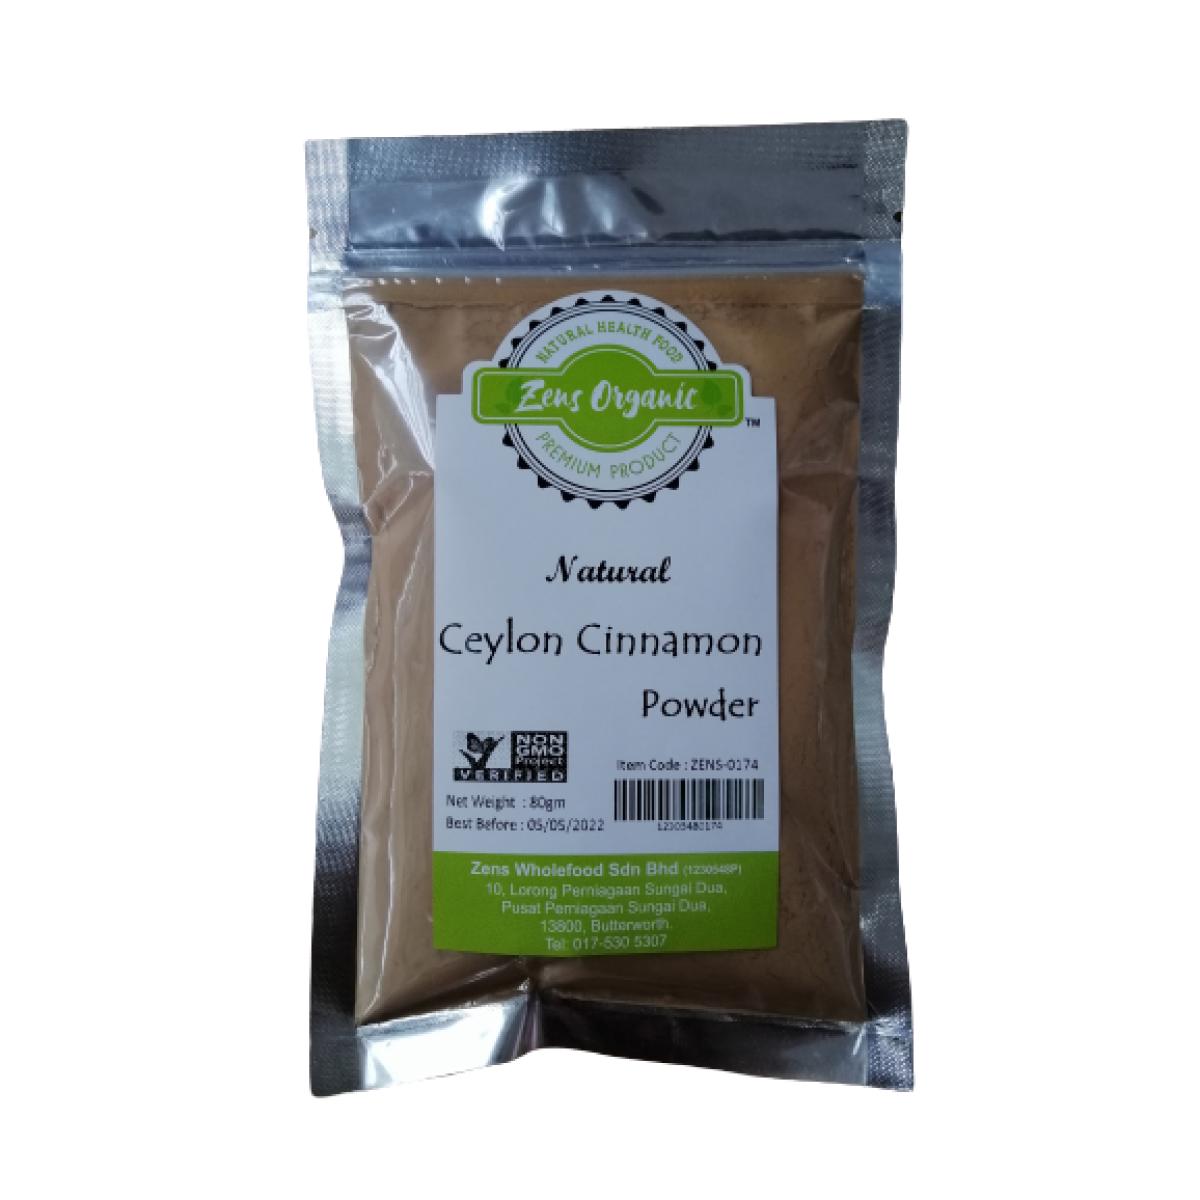 Zens Organic Natural Ceylon Cinnamon Powder 80g